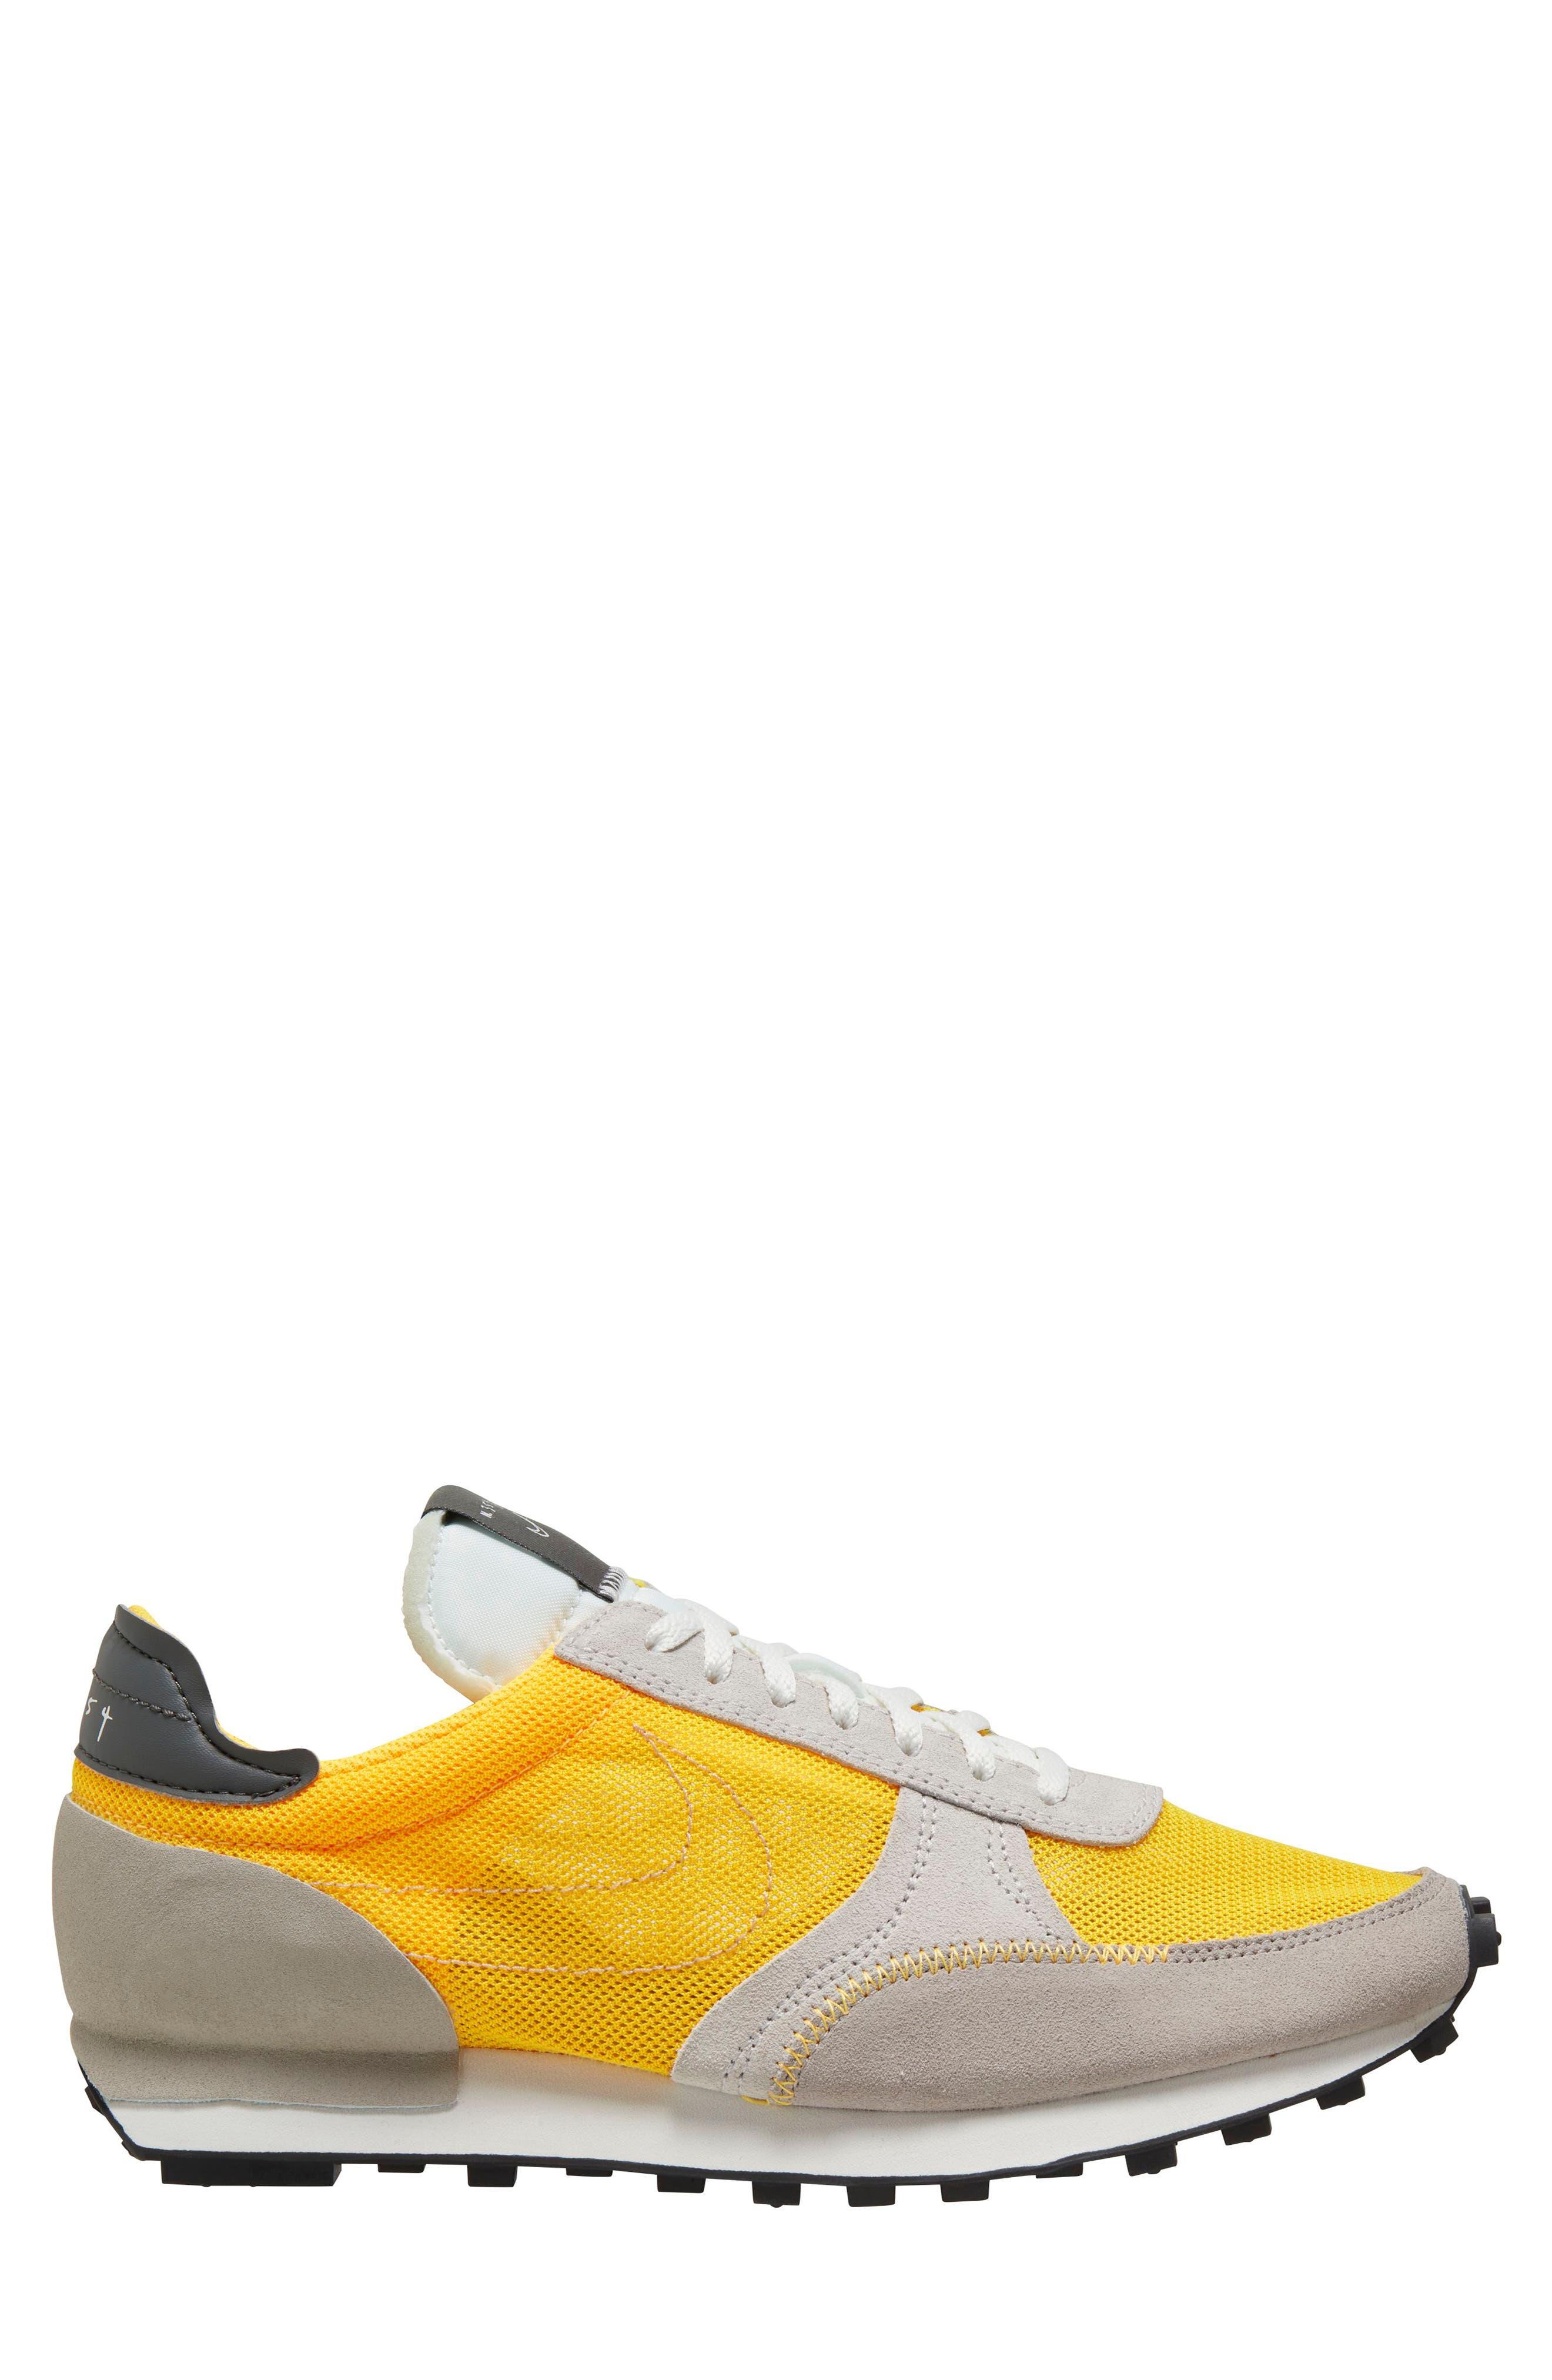 Men's Grey Nike Shoes | Nordstrom